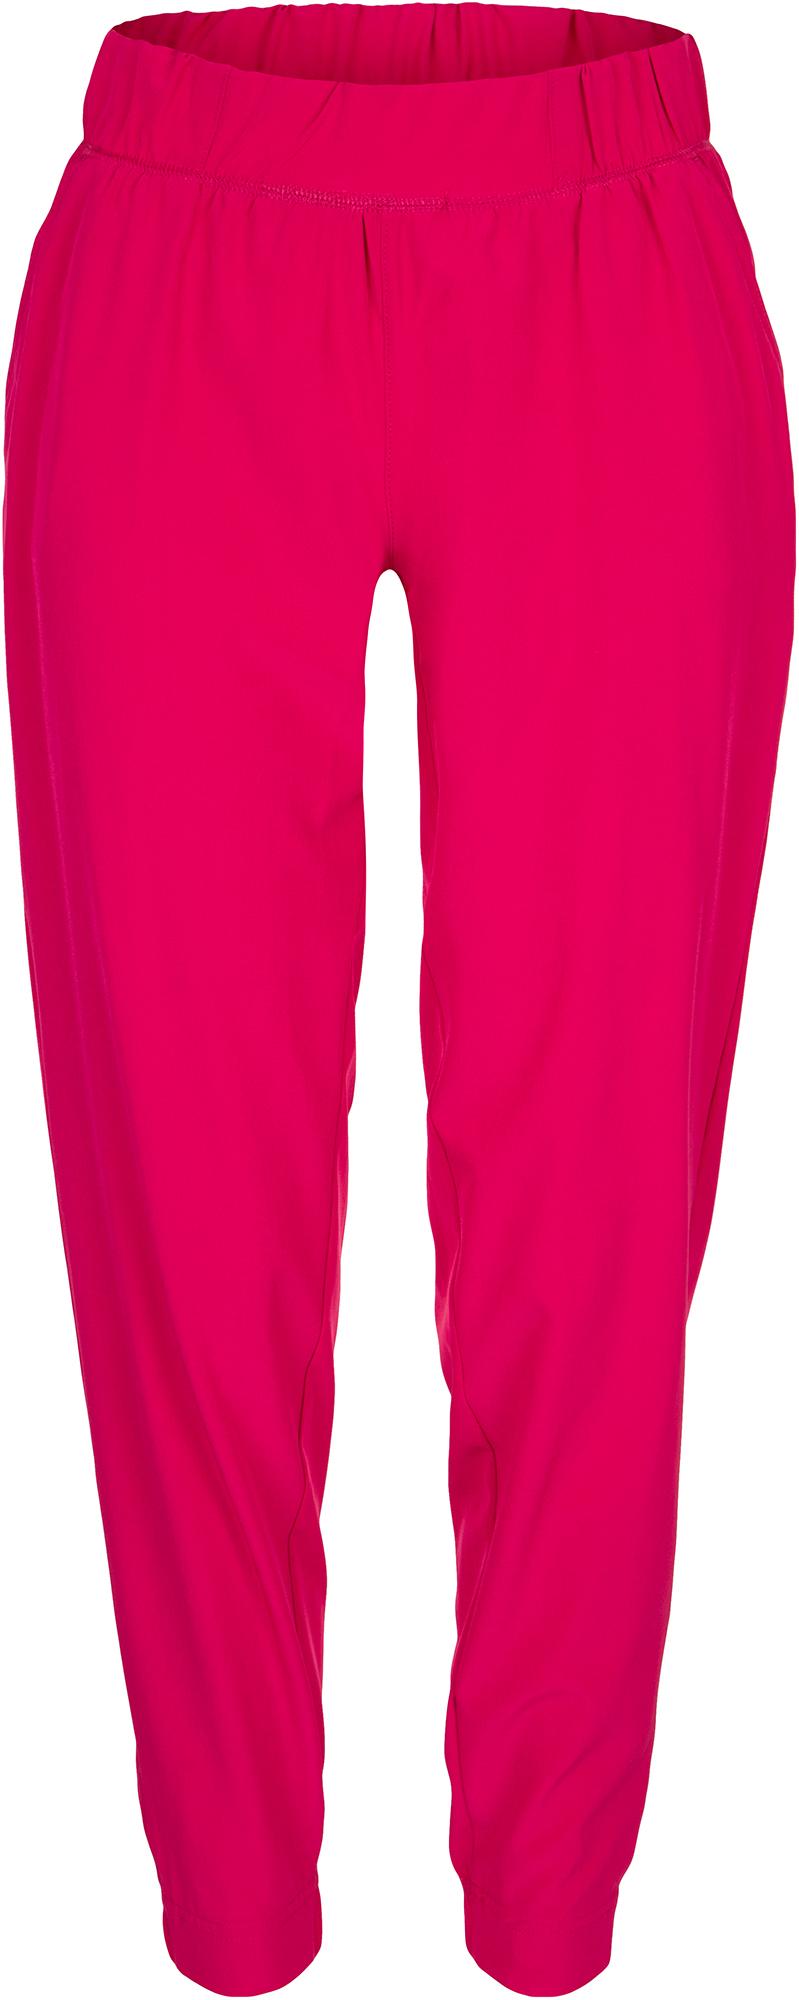 Outventure Брюки женские Outventure, размер 46 брюки женские oodji ultra цвет темно изумрудный 11706190 5b 32887 6e00n размер 40 46 170